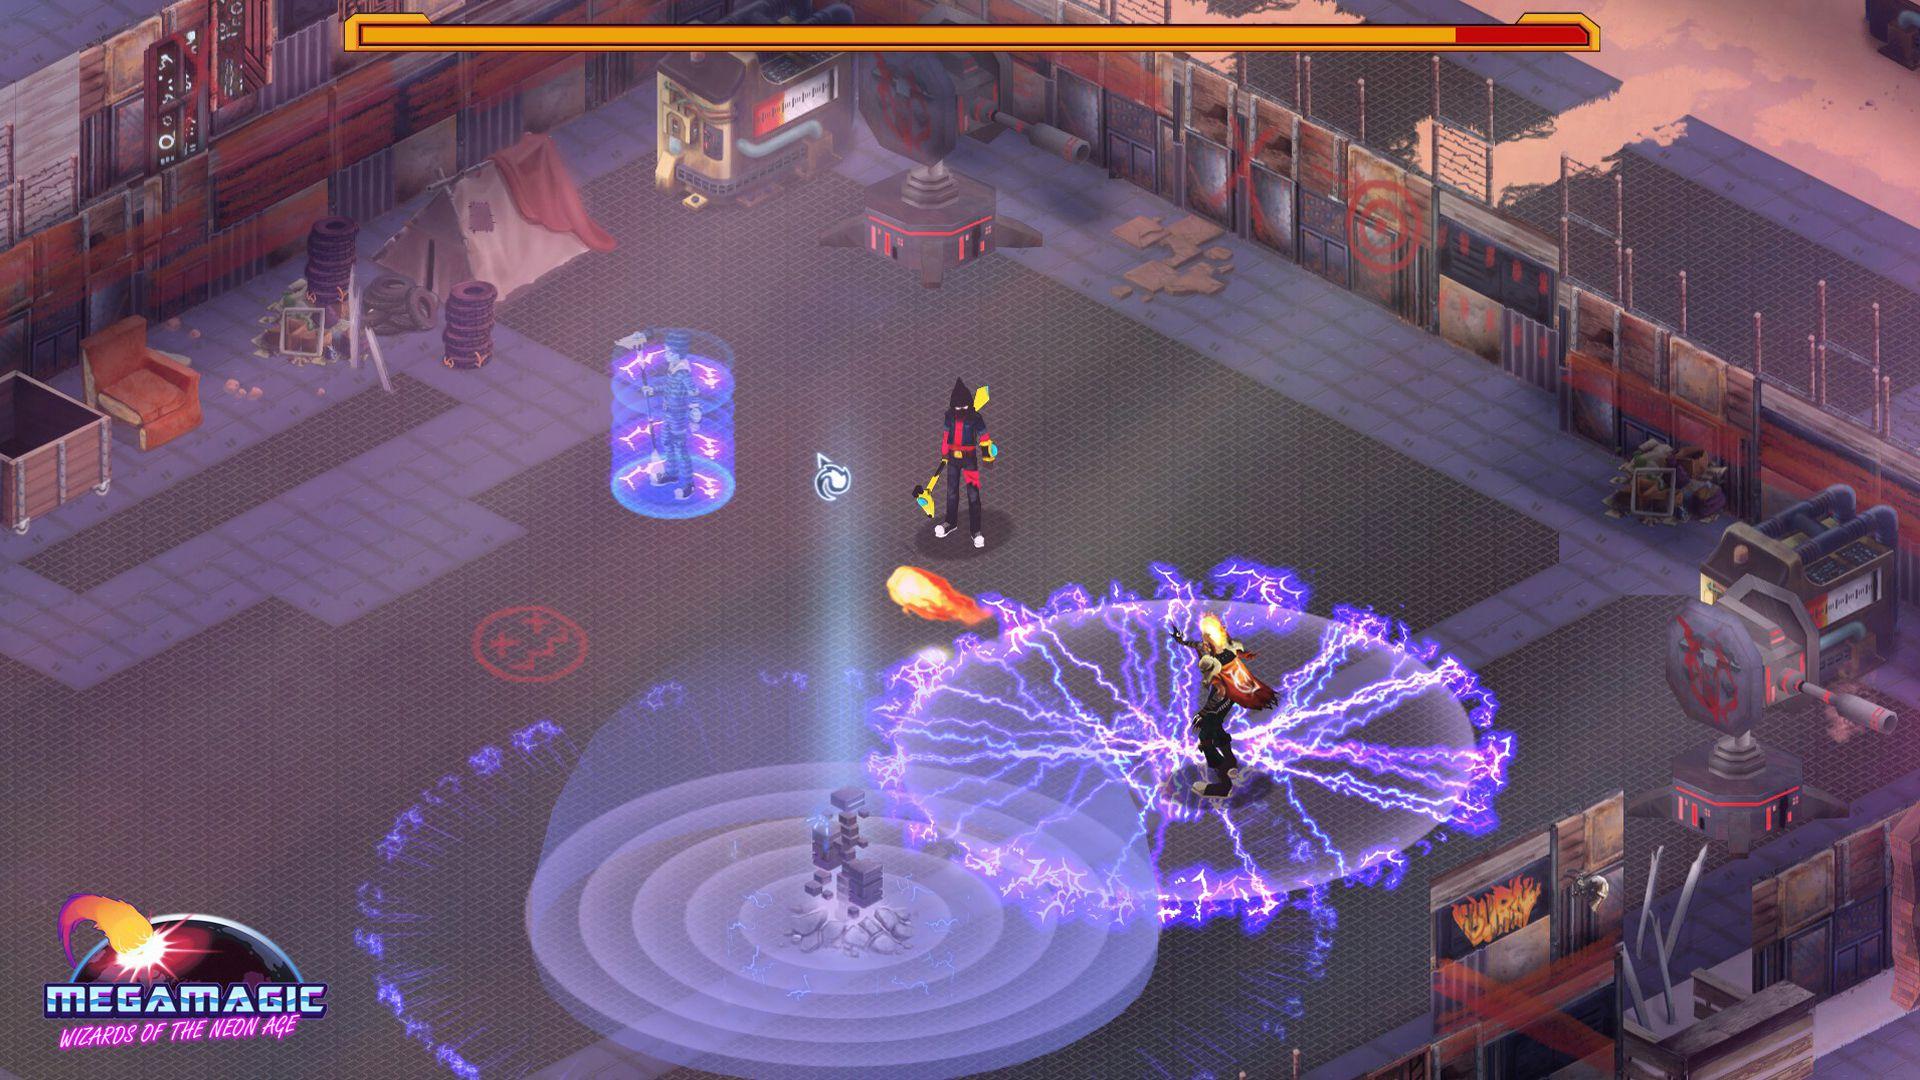 Megamagic: Wizards of the Neon Age Captura 3